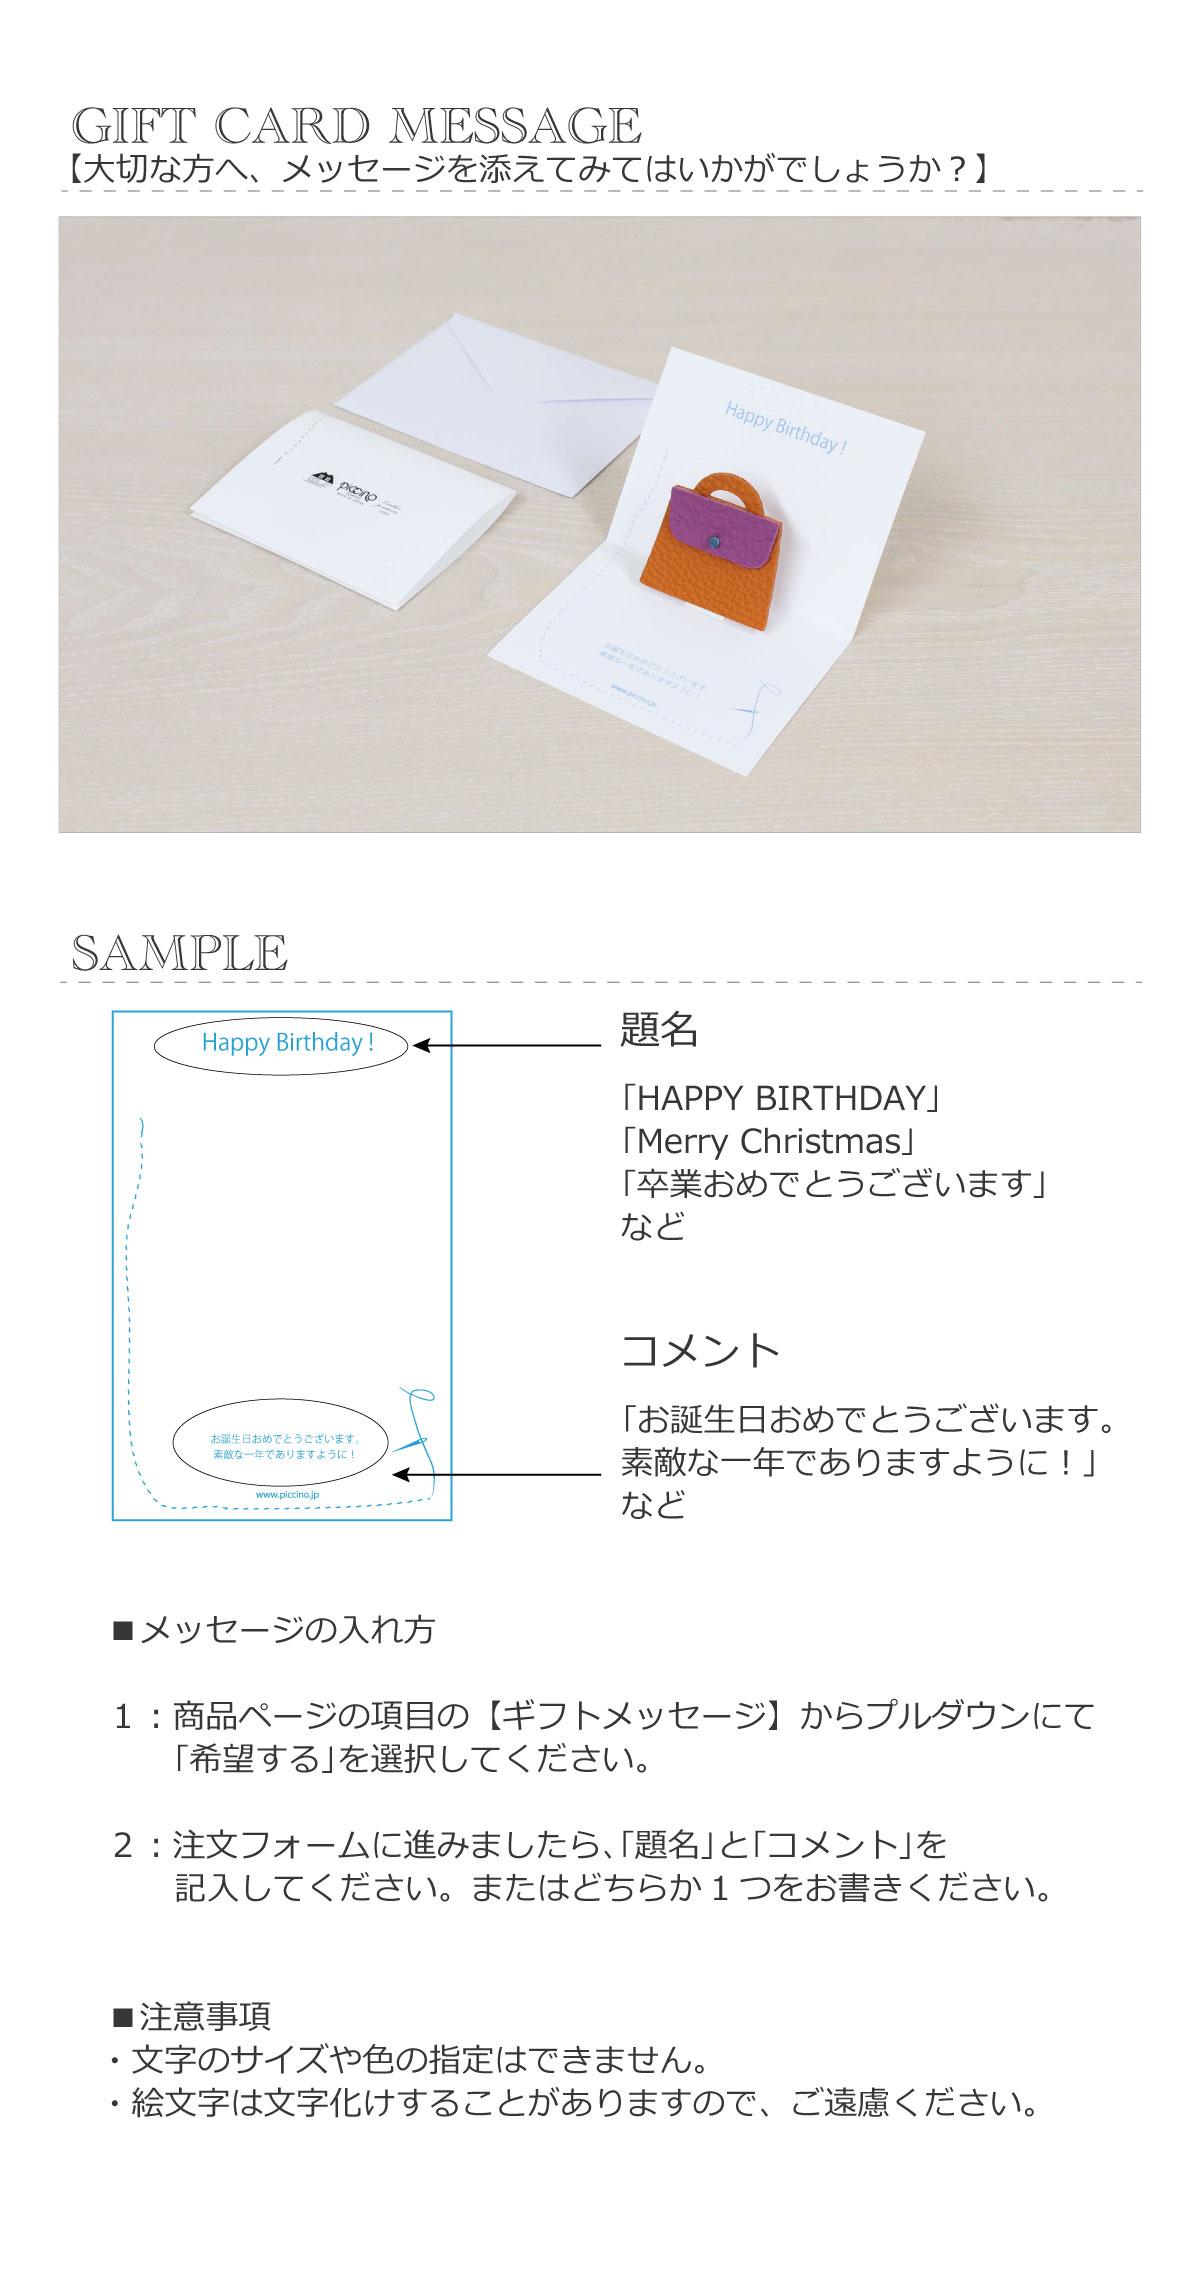 https://gigaplus.makeshop.jp/piccinobag/giftbox/giftcardmessage3-1200.jpg